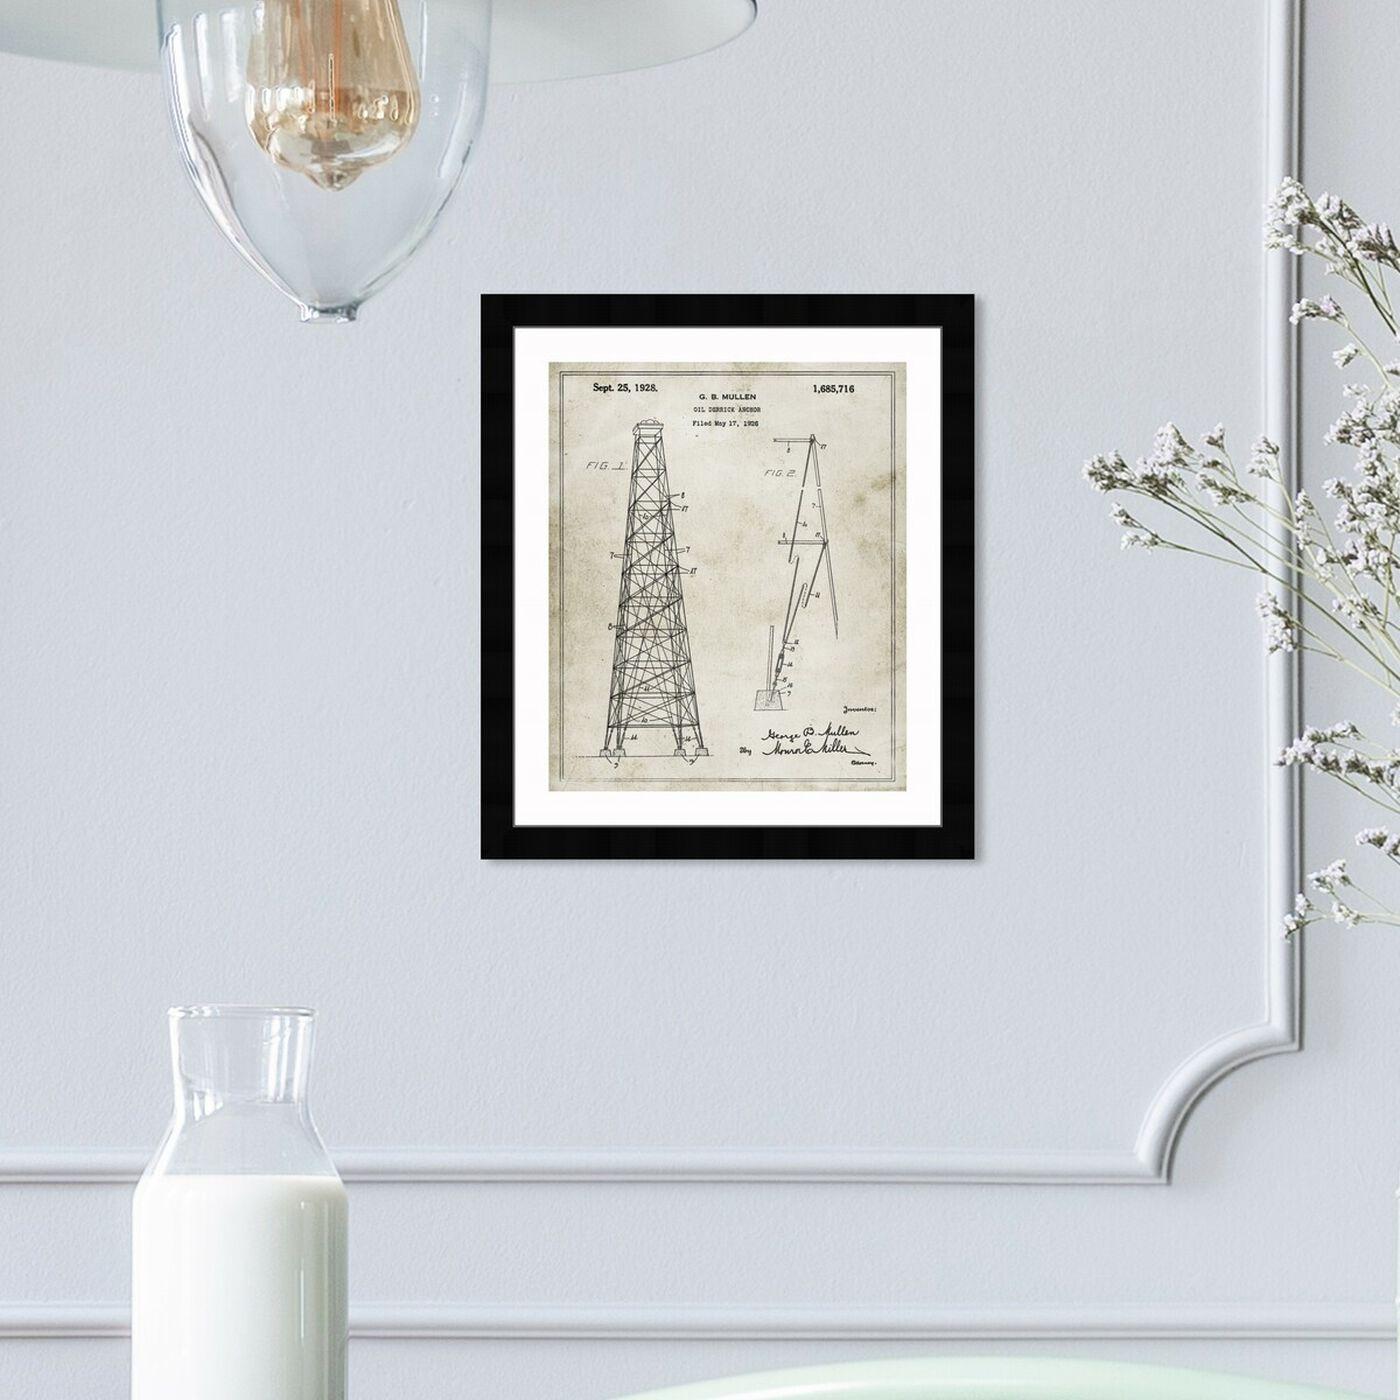 Hanging view of Oil-Derrick Anchor 1928 art.